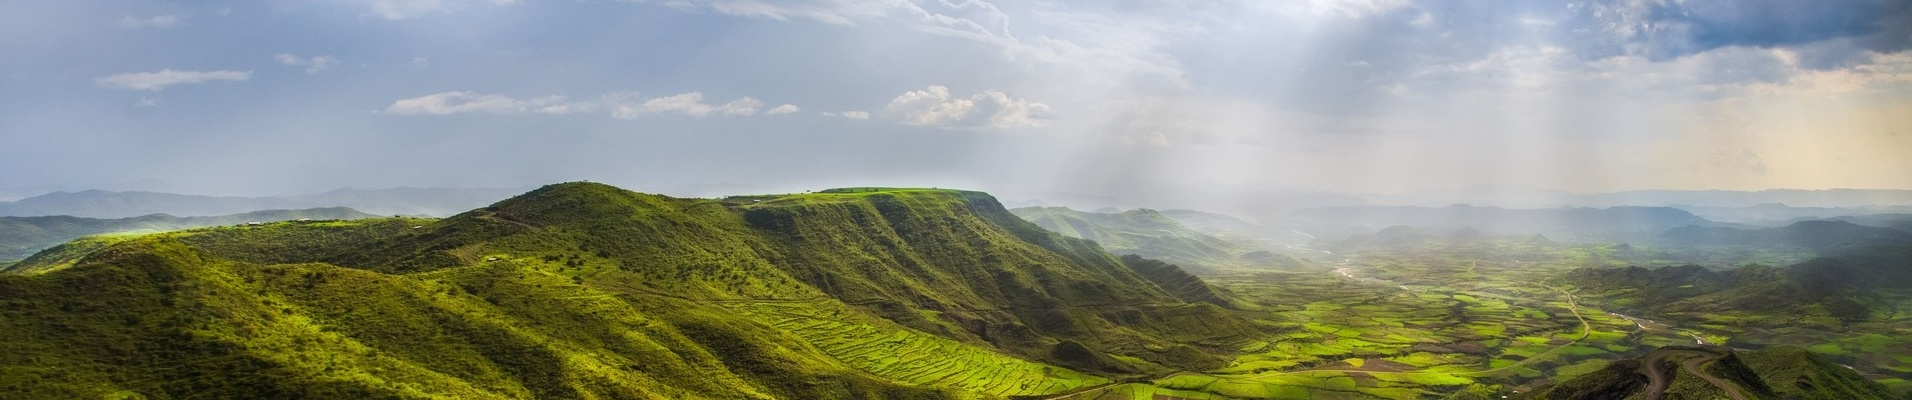 Circuit en Ethiopie - montagnes de Lalibela